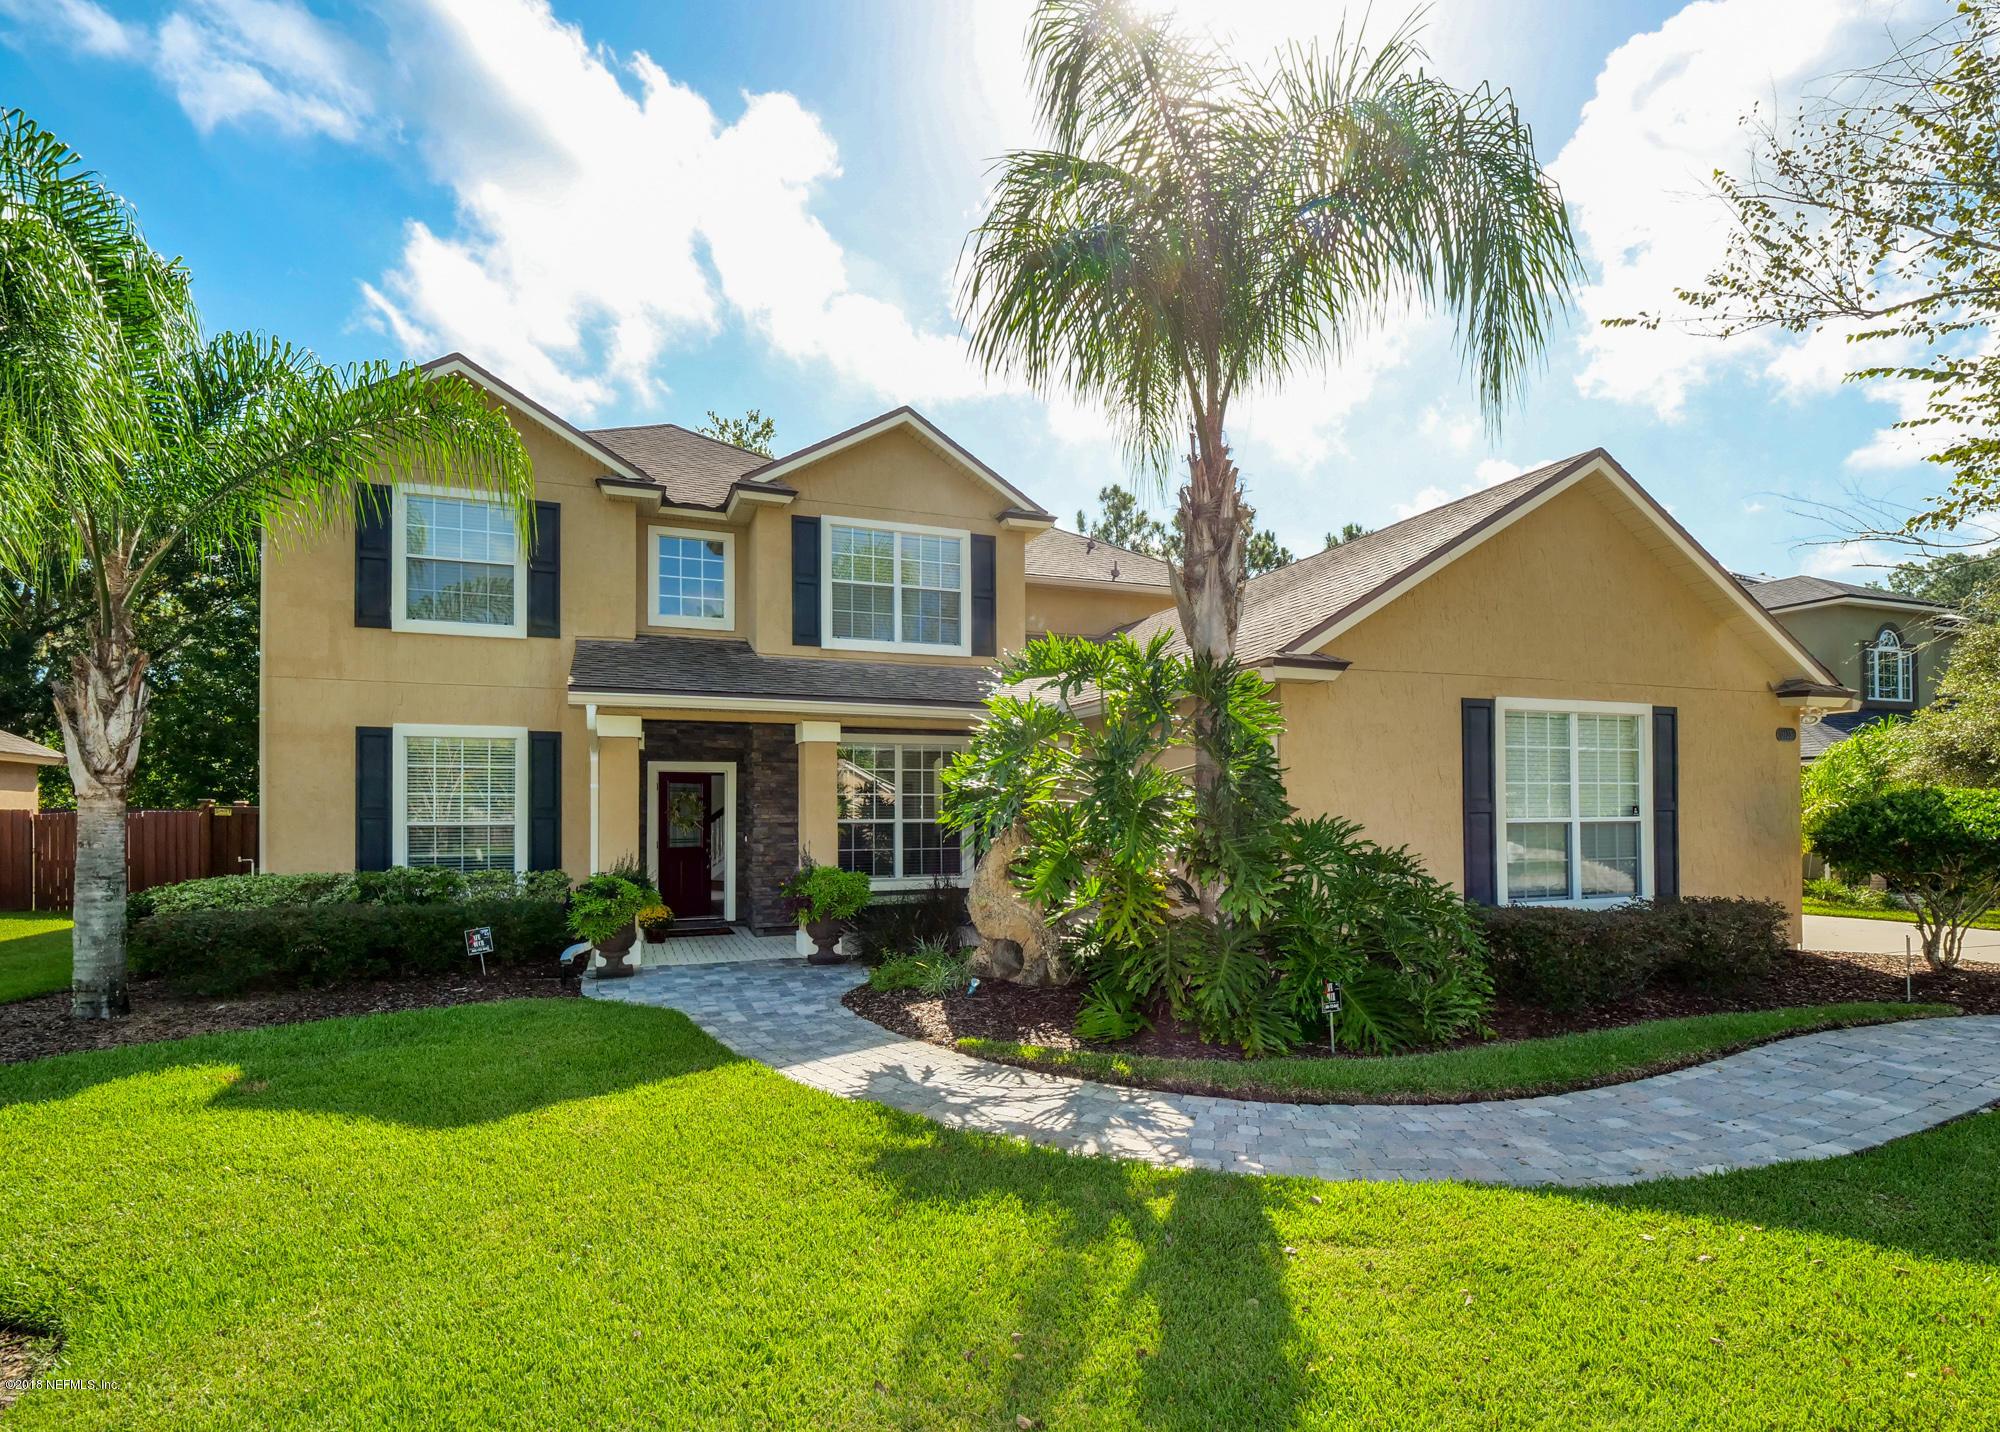 11125 MONARCH LANDING, JACKSONVILLE, FLORIDA 32257, 4 Bedrooms Bedrooms, ,3 BathroomsBathrooms,Residential - single family,For sale,MONARCH LANDING,959664